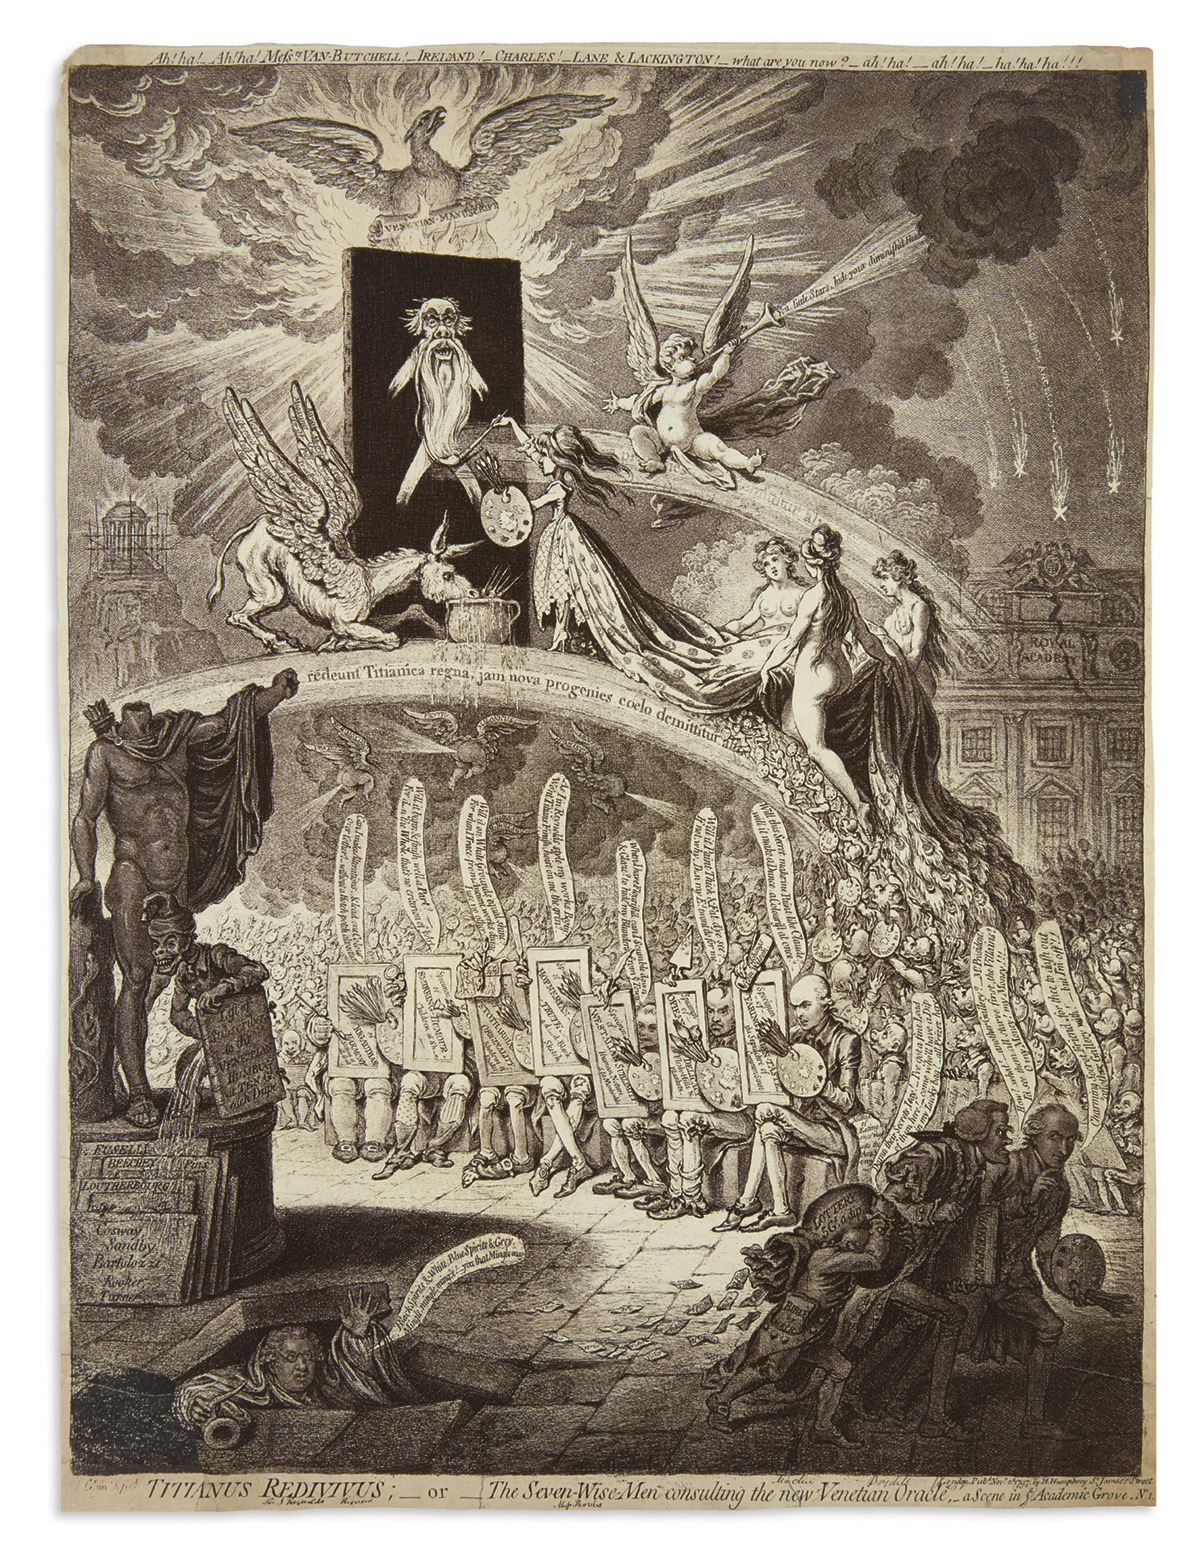 GILLRAY-JAMES-Titianus-Redivivus;orThe-Seven-Wise-Men-Consul